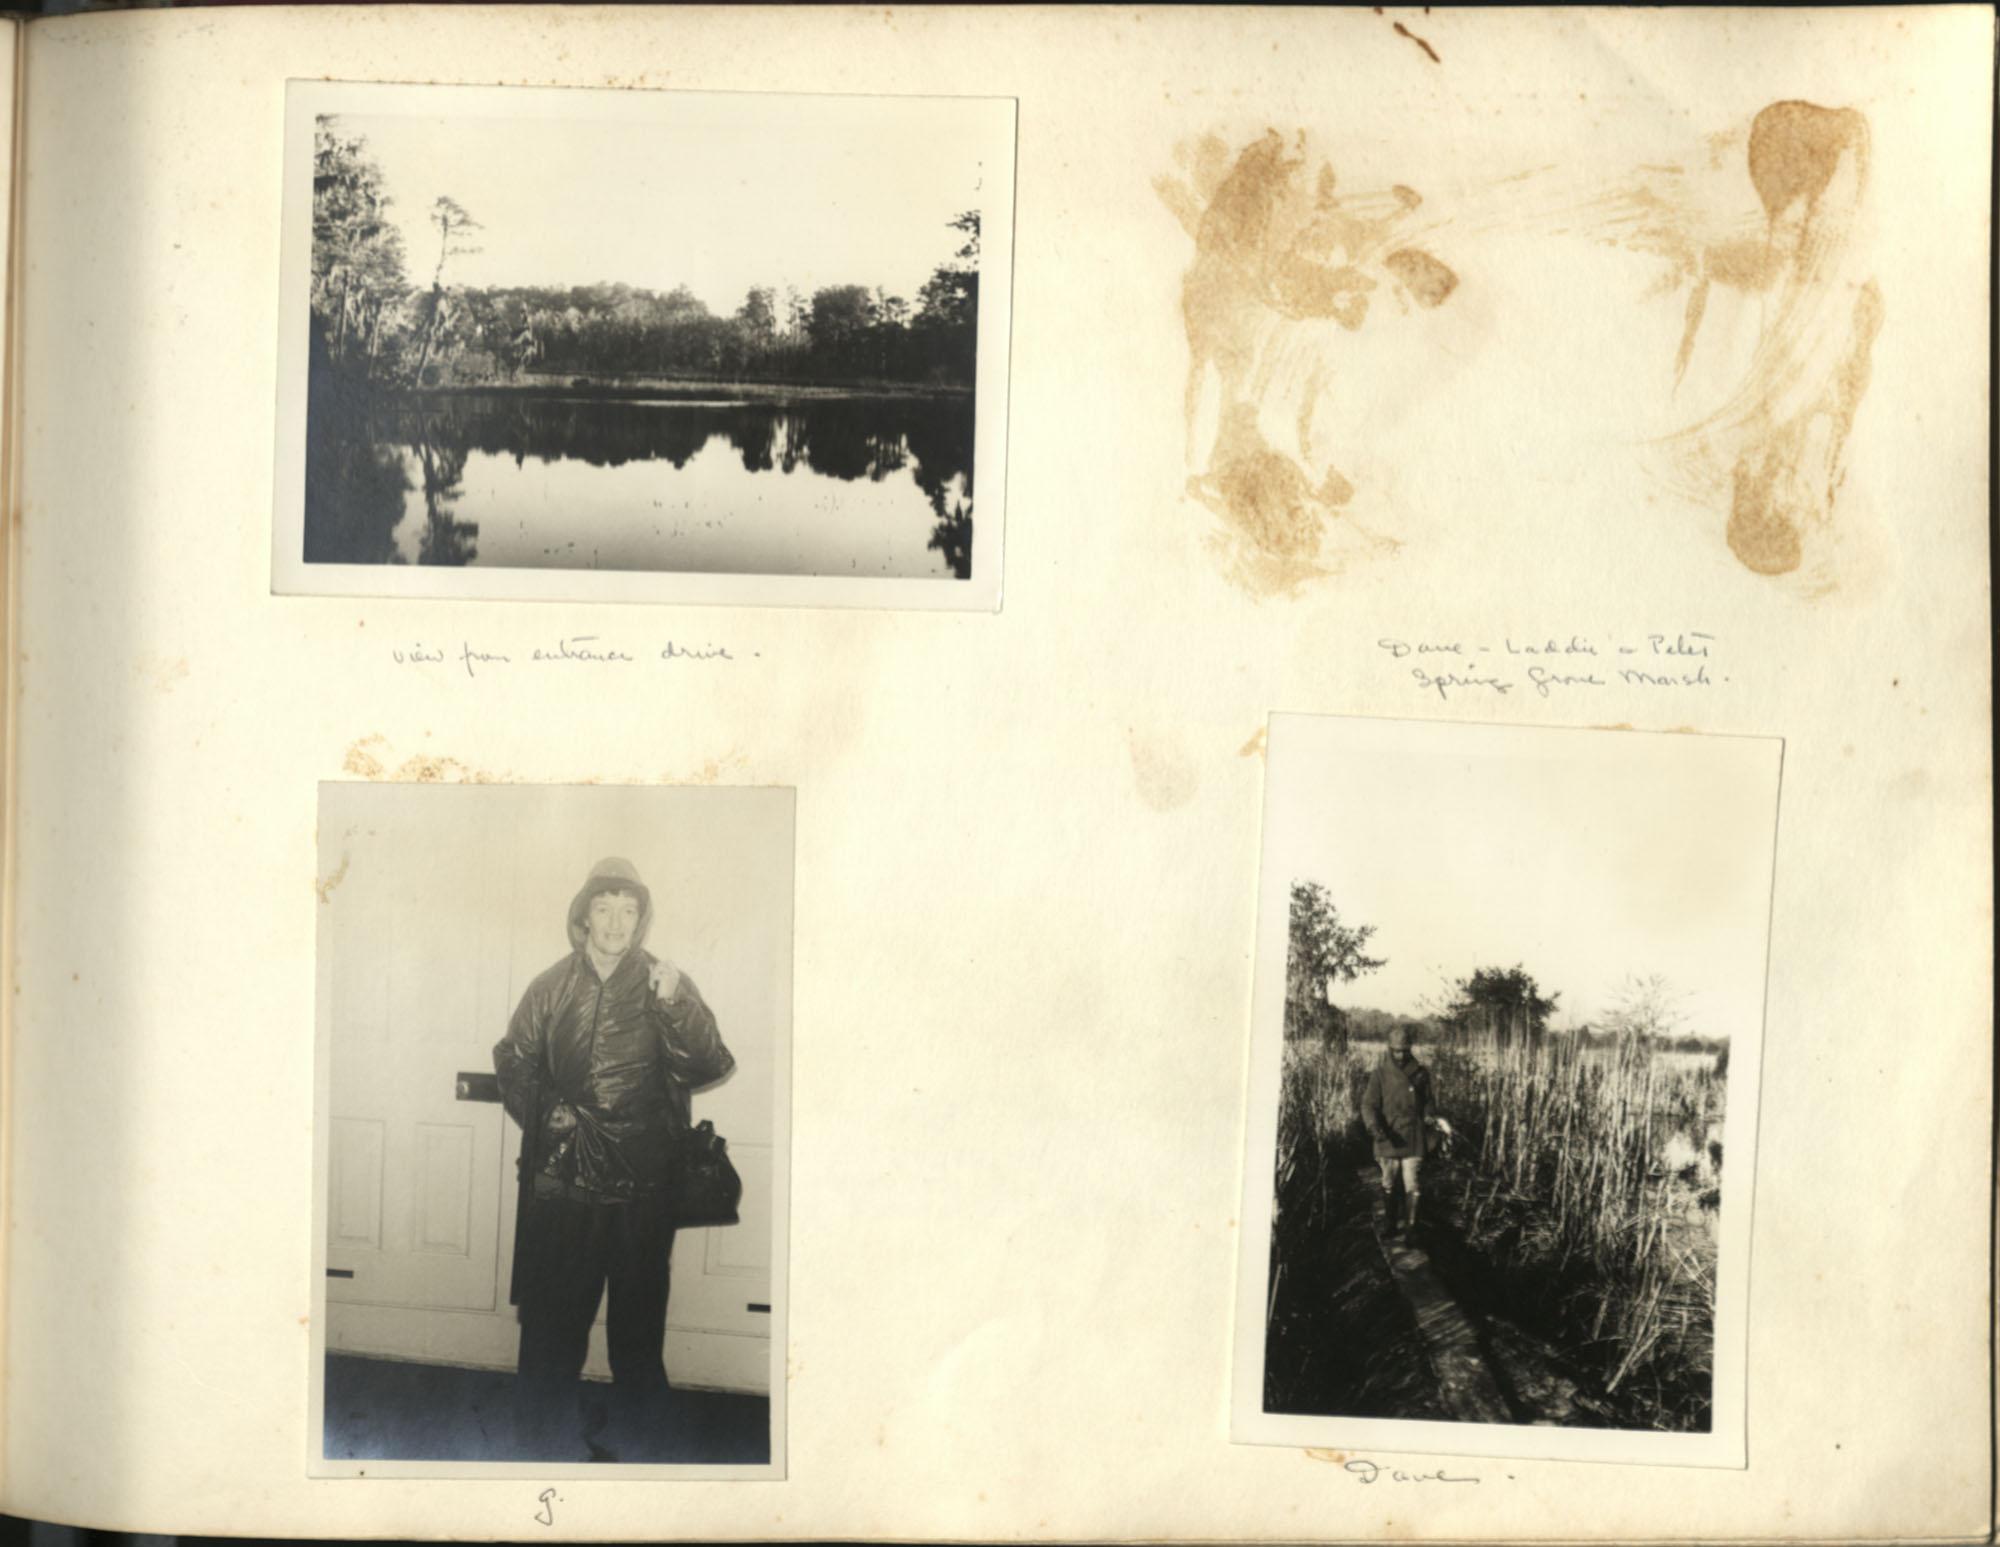 Medway Plantation Photograph Album, 1949, page 129